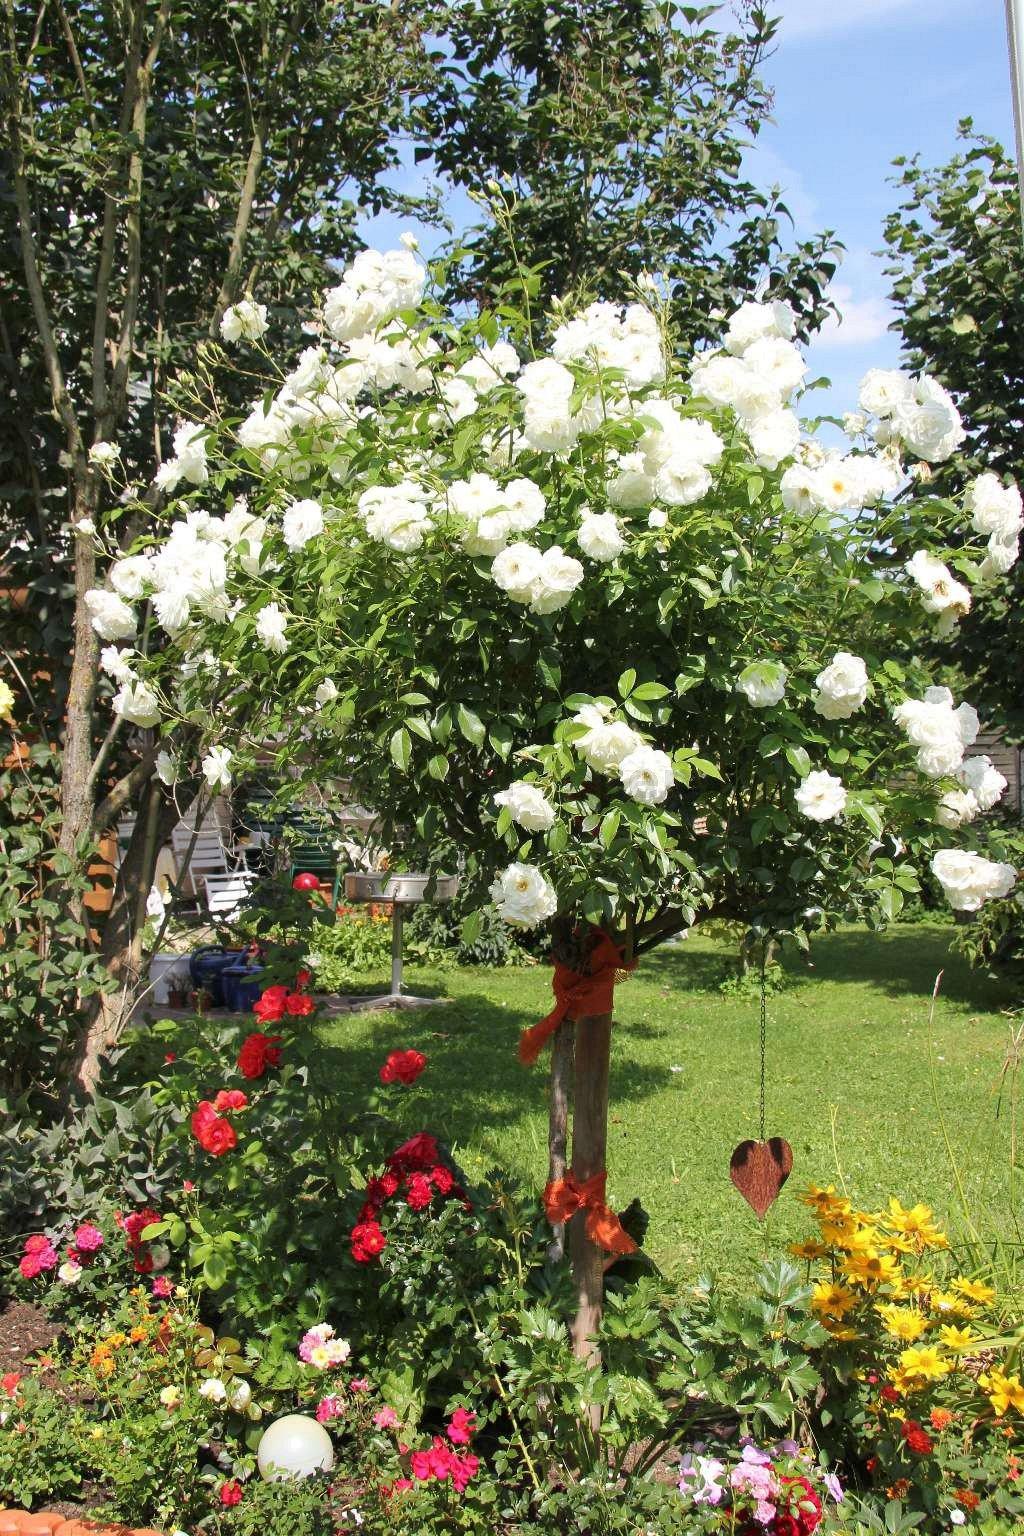 schneewittchen shrub rose buy at agel rosen. Black Bedroom Furniture Sets. Home Design Ideas